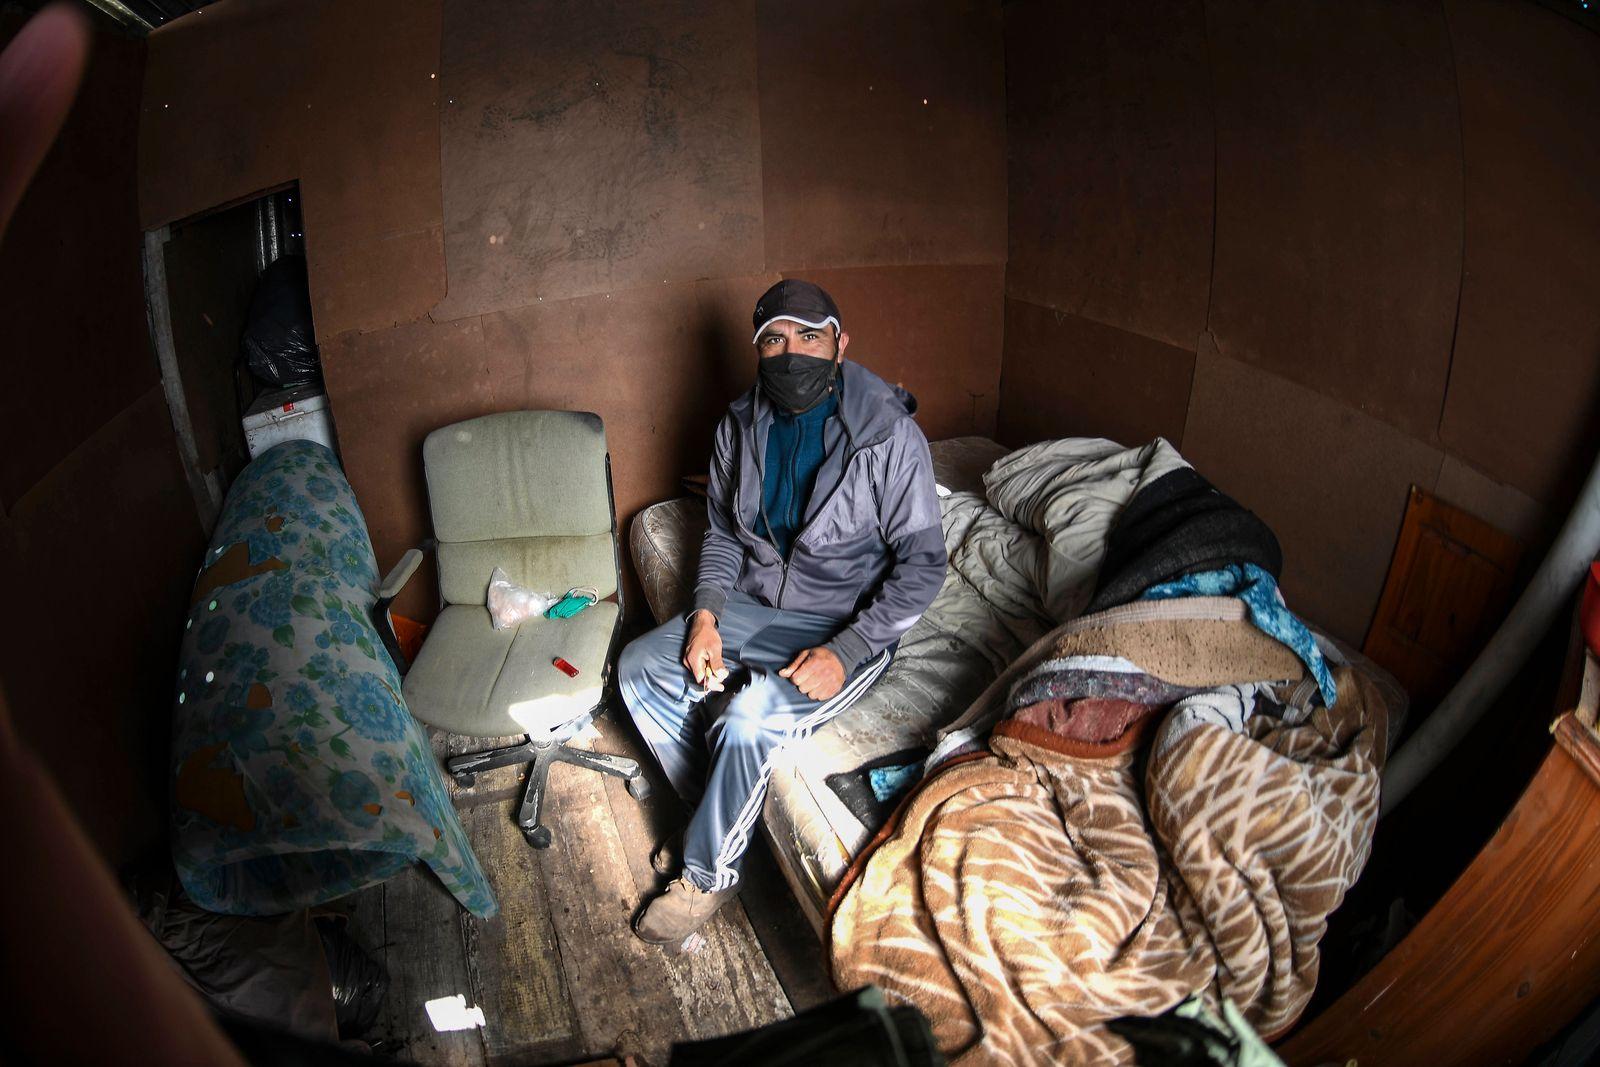 Armut in Argentinien